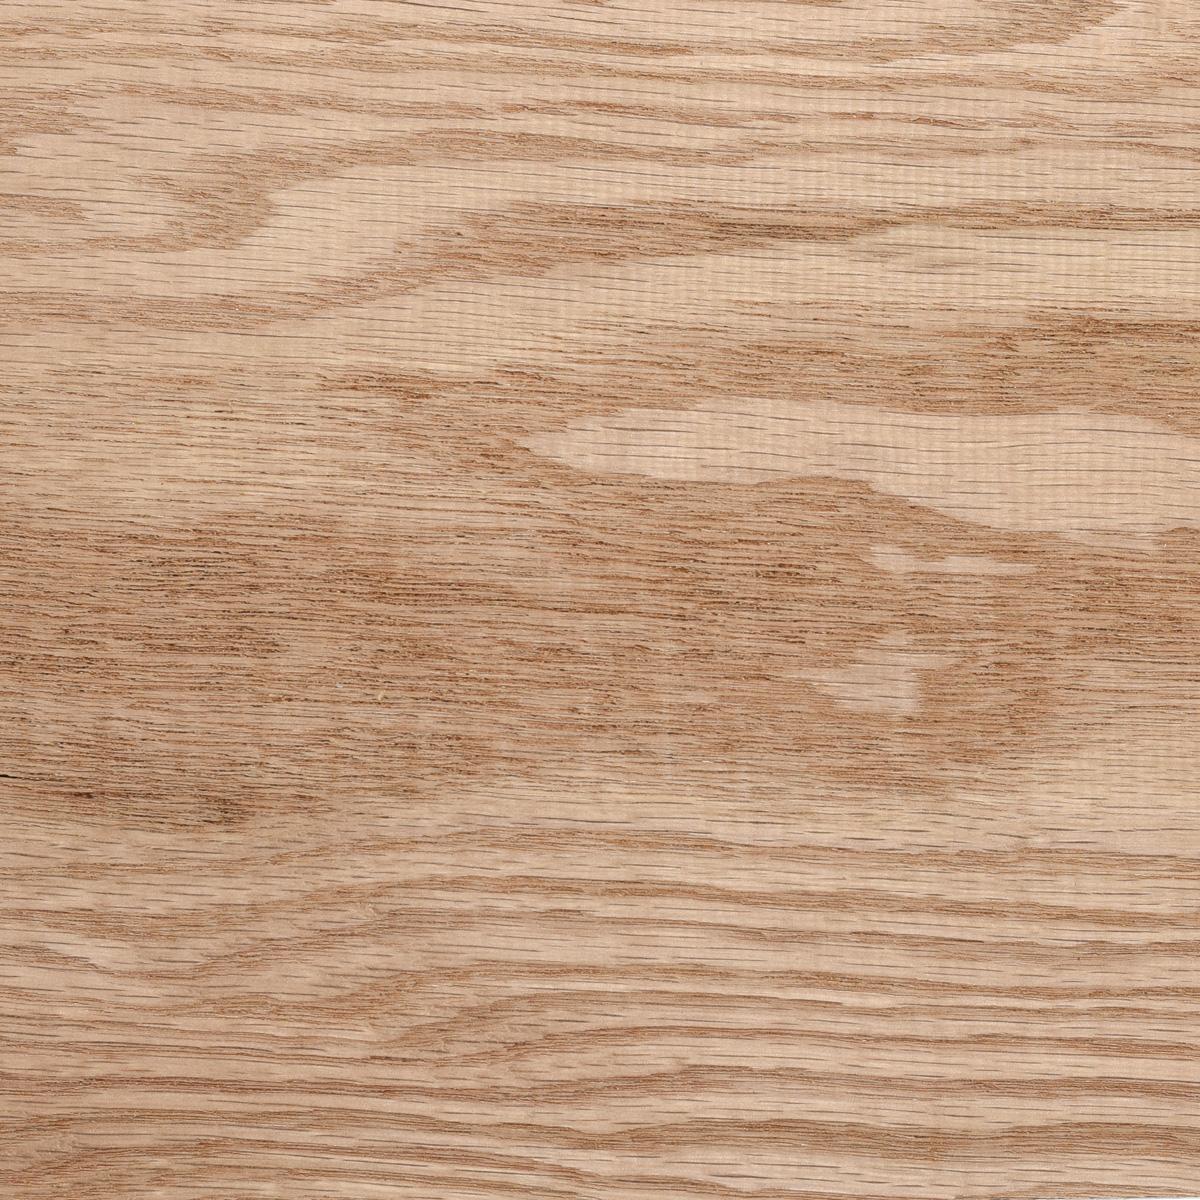 Red Oak Quality Hardwoods